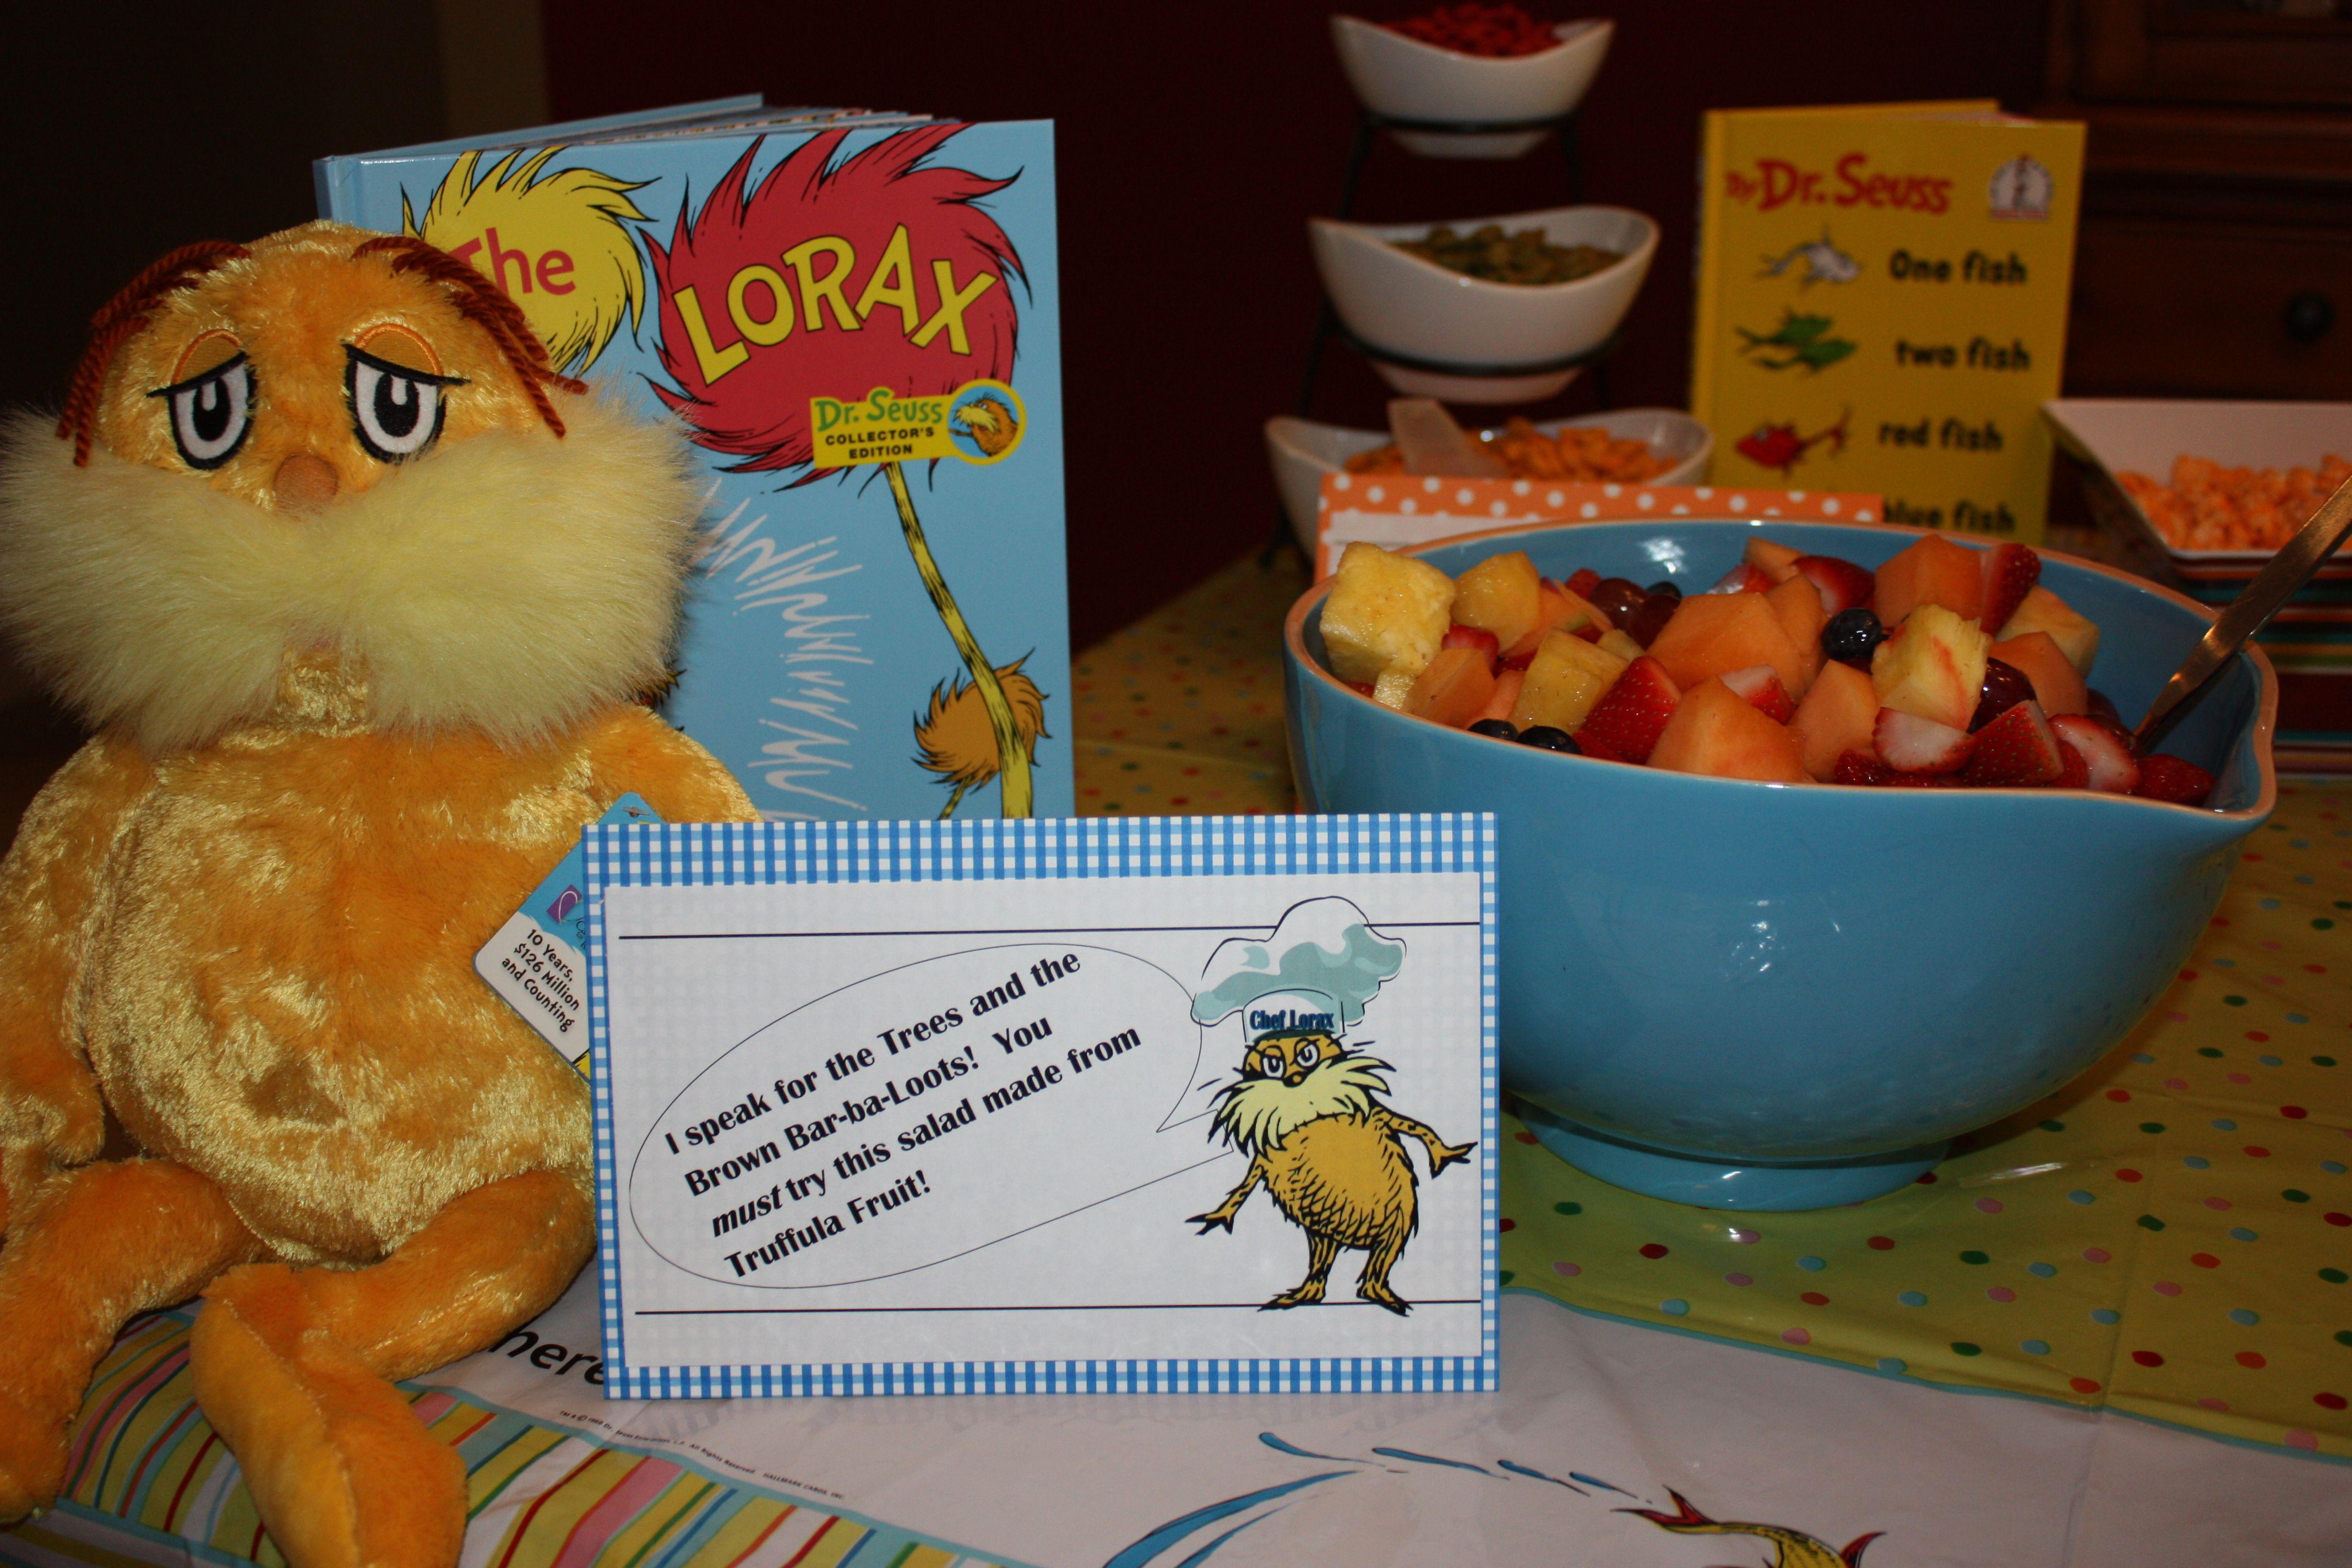 Baby Shower Food Menu Ideas ~ Barbaloot fruit baby shower food menu ideas pinterest